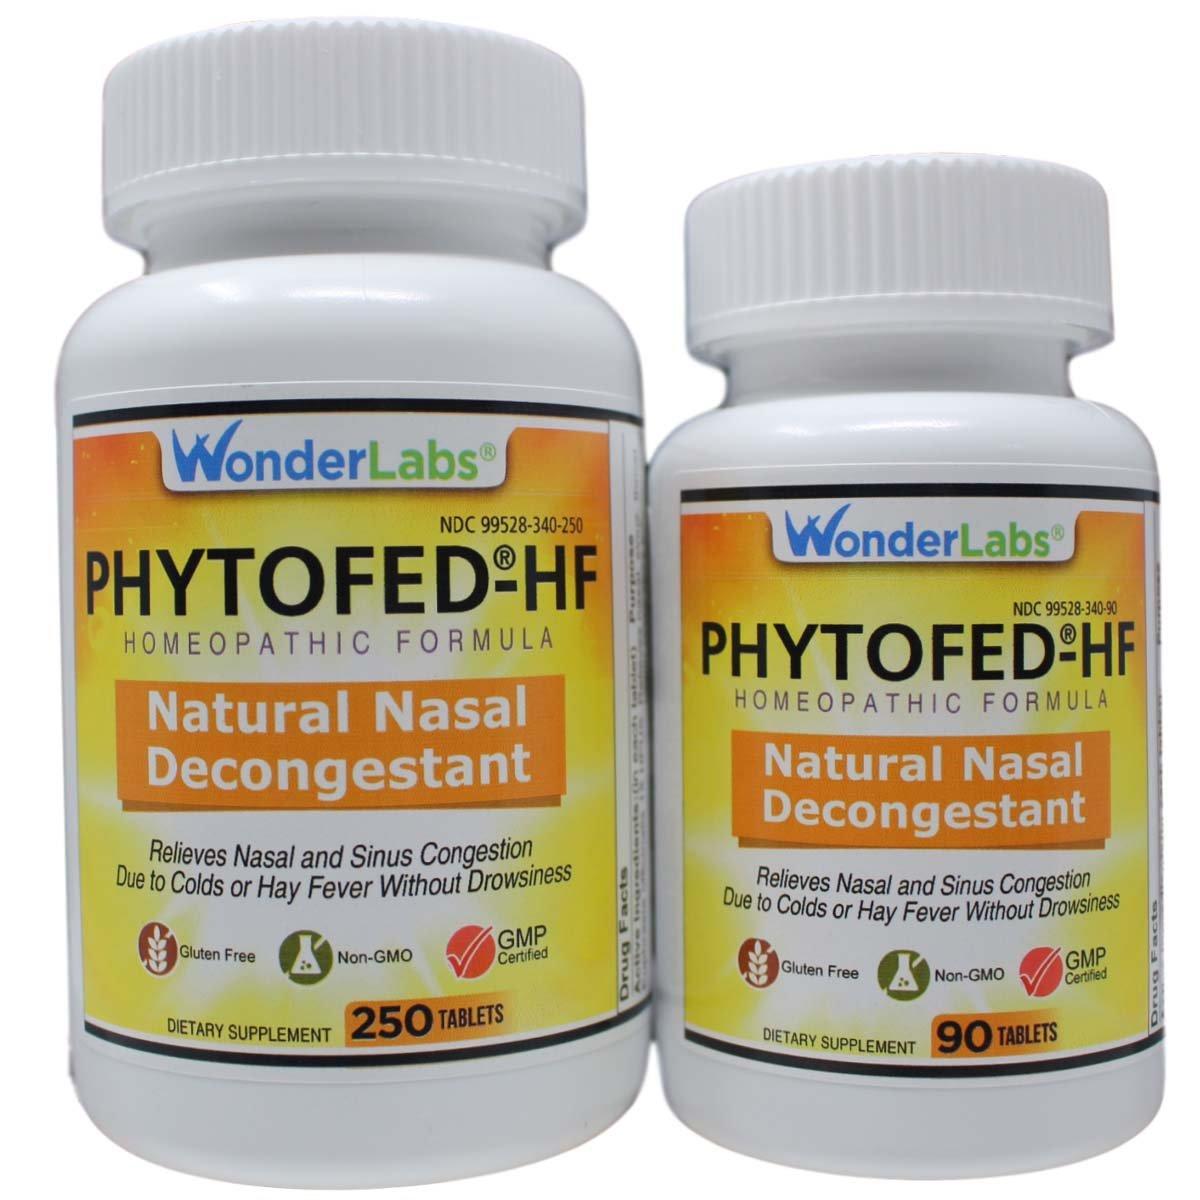 Sinus Relief Nasal Decongestant PHYTOFED-HF Natural Nasal Decongestant - 340 Total Tablets #3402